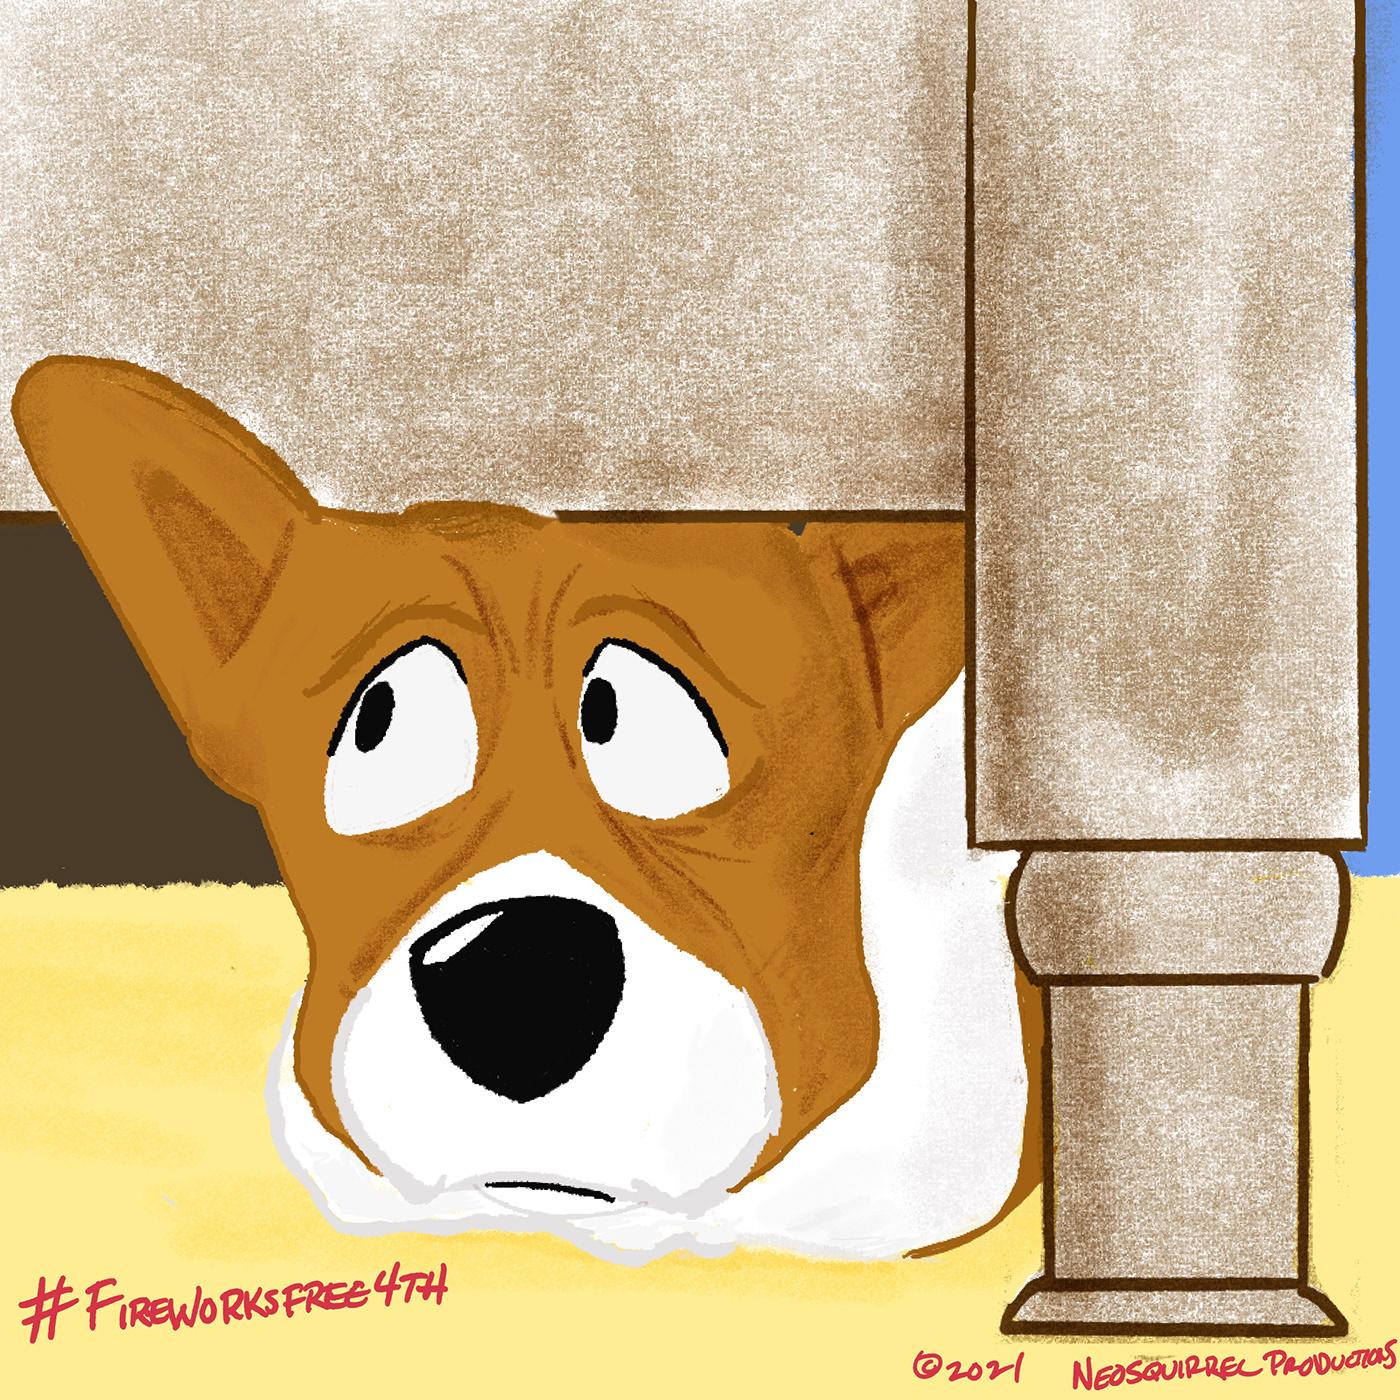 4th of July Cartooning  characterdesign DIGITALDRAWING dog Drawing  ILLUSTRATION  Illustrator Procreate sketch